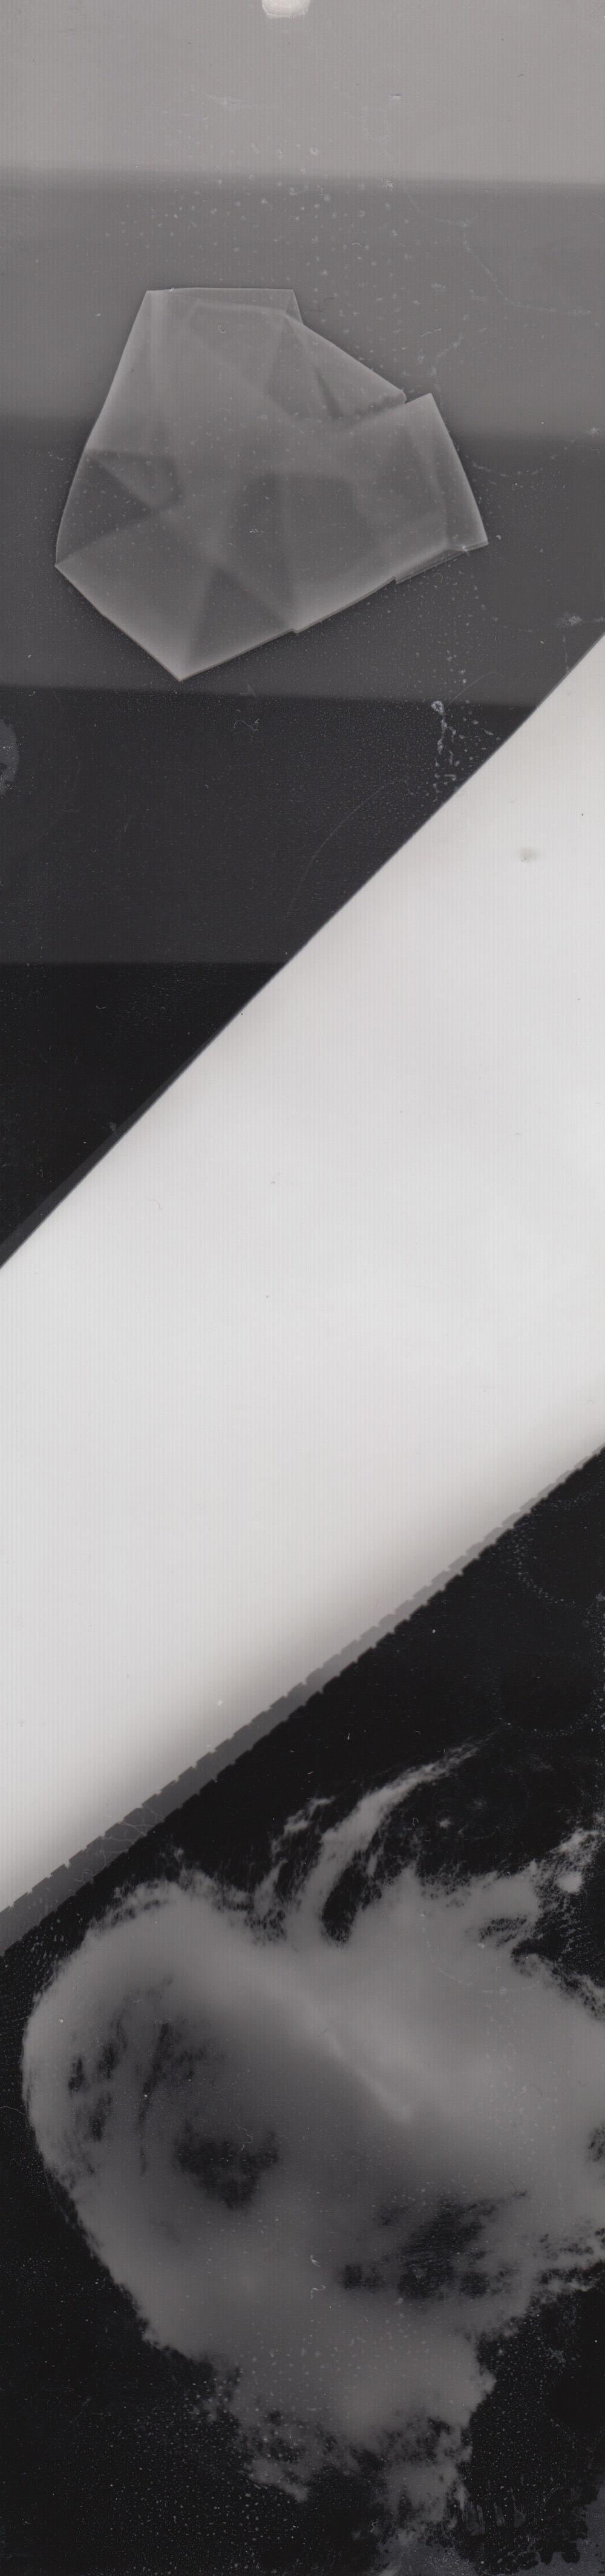 Test Strip - Photogram